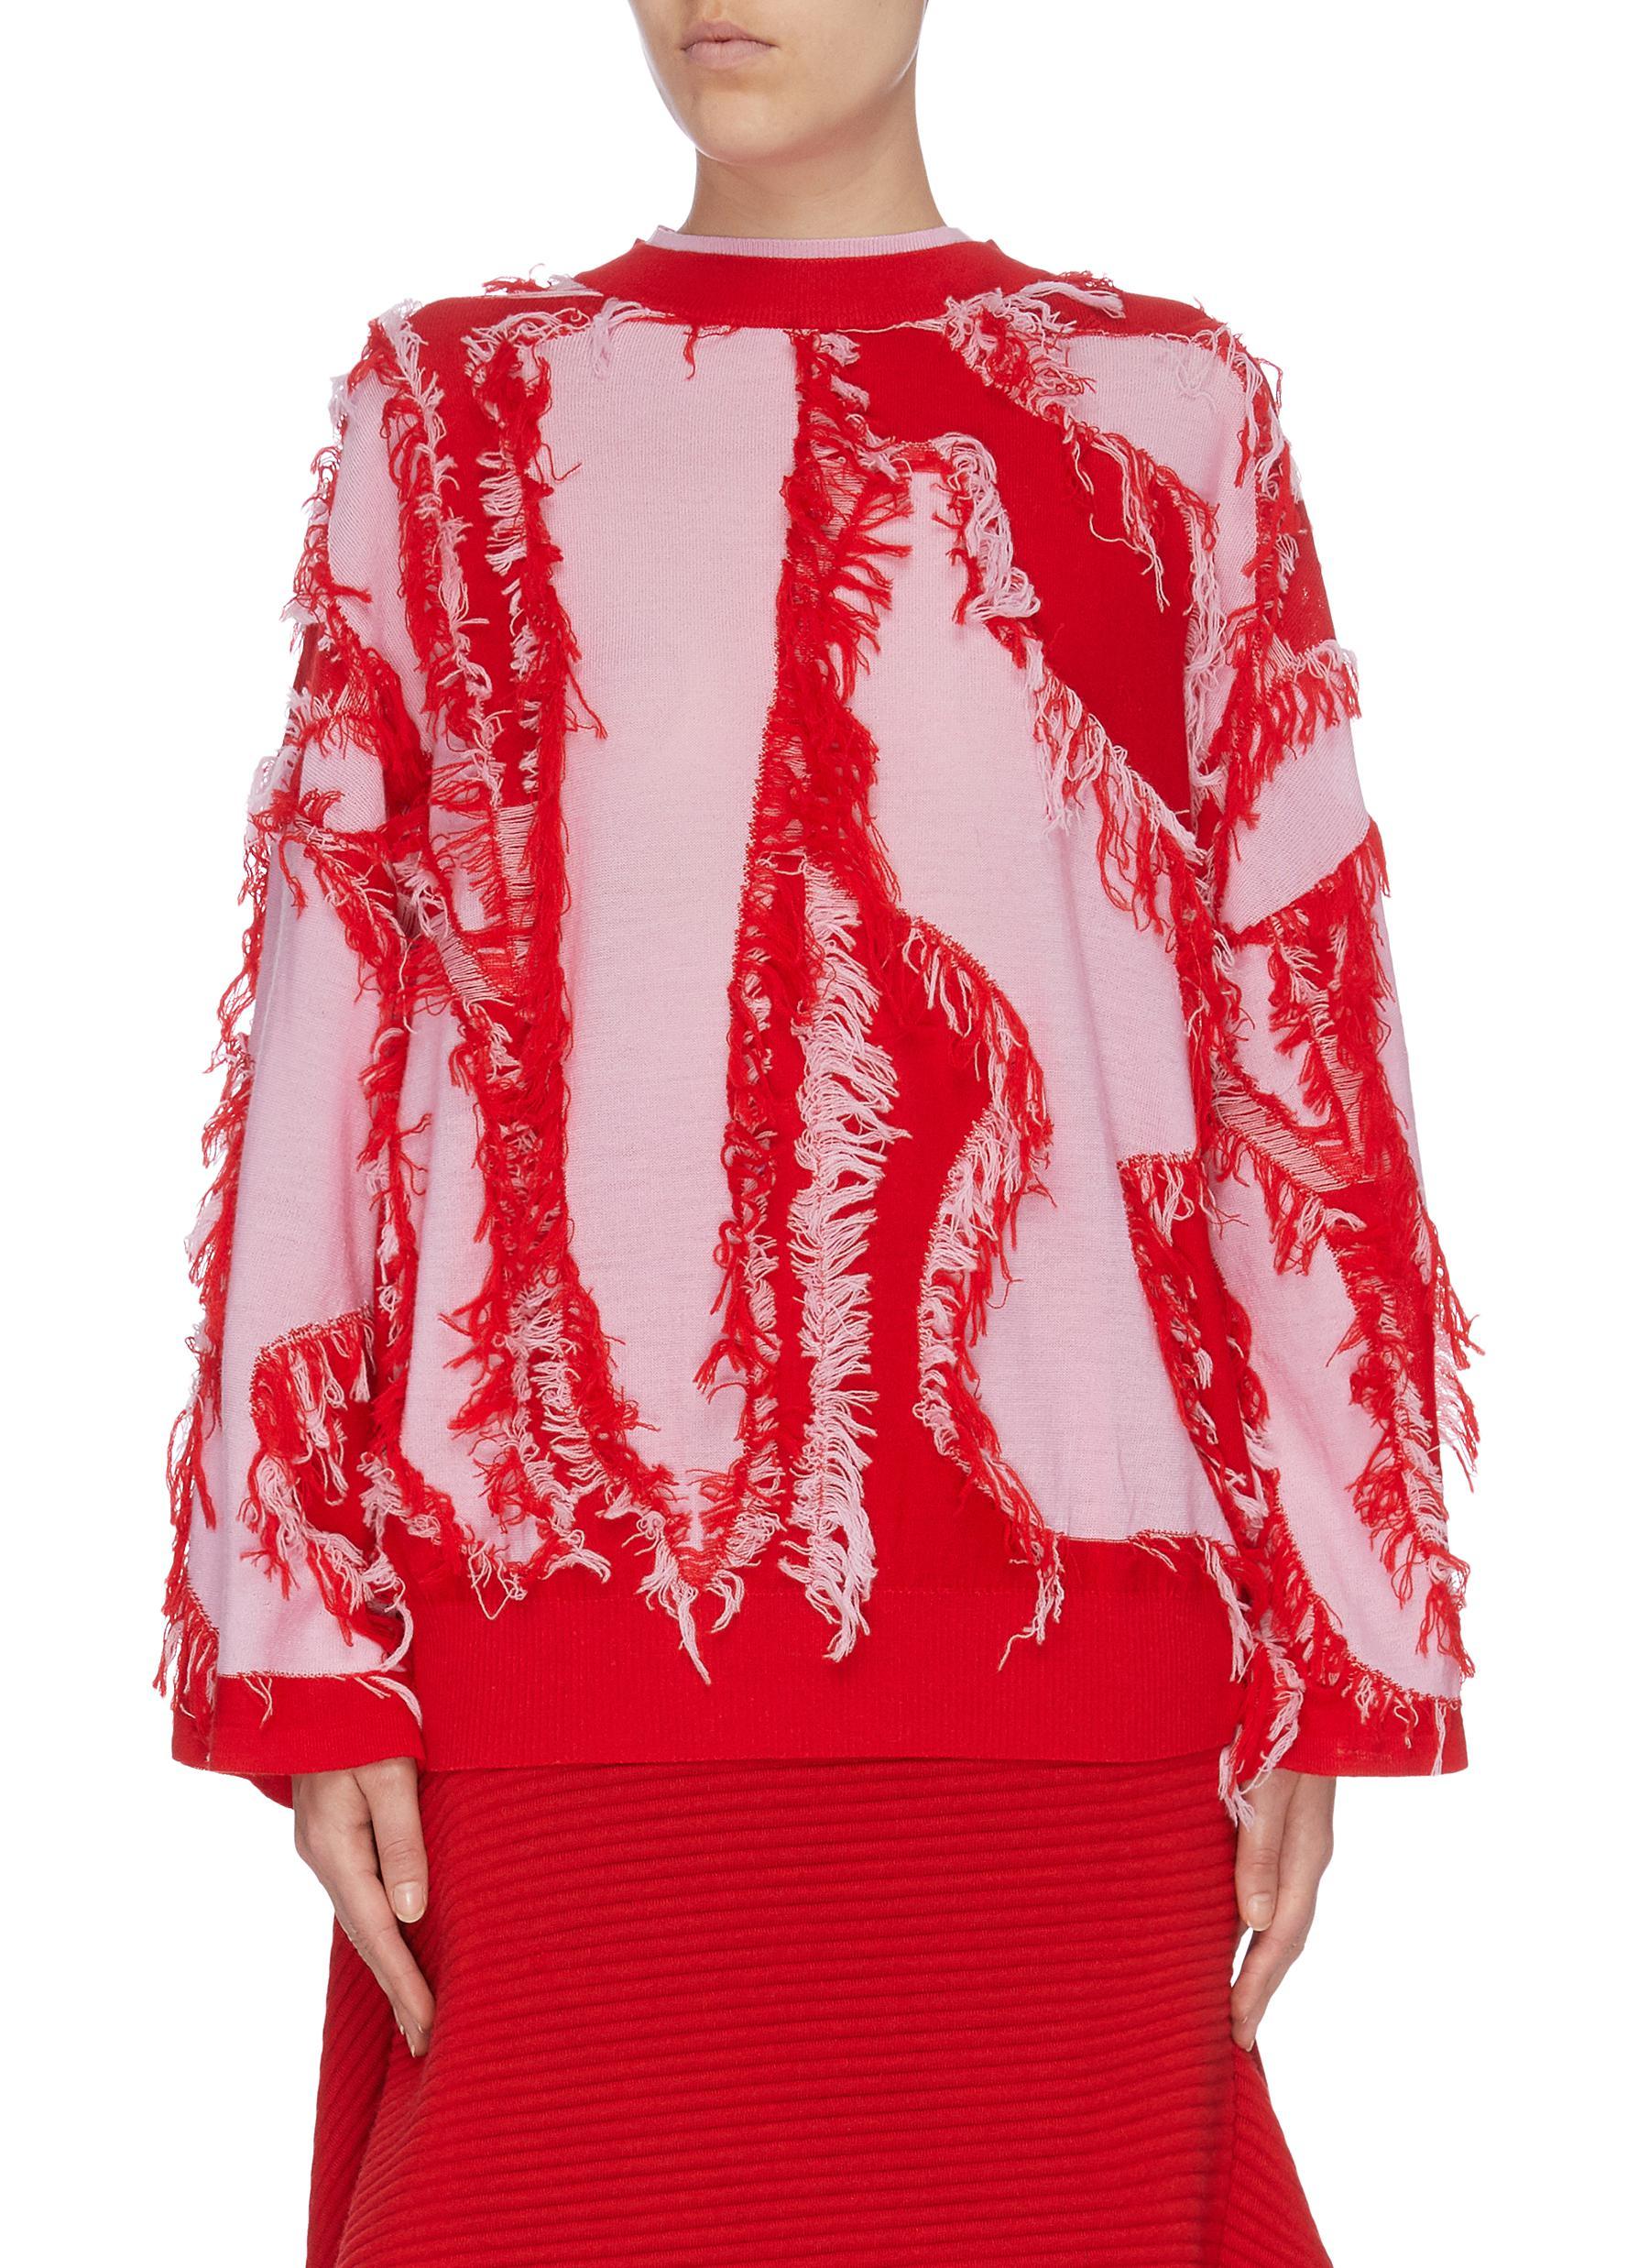 x Woolmark fringe colourblock front sweater by I-Am-Chen